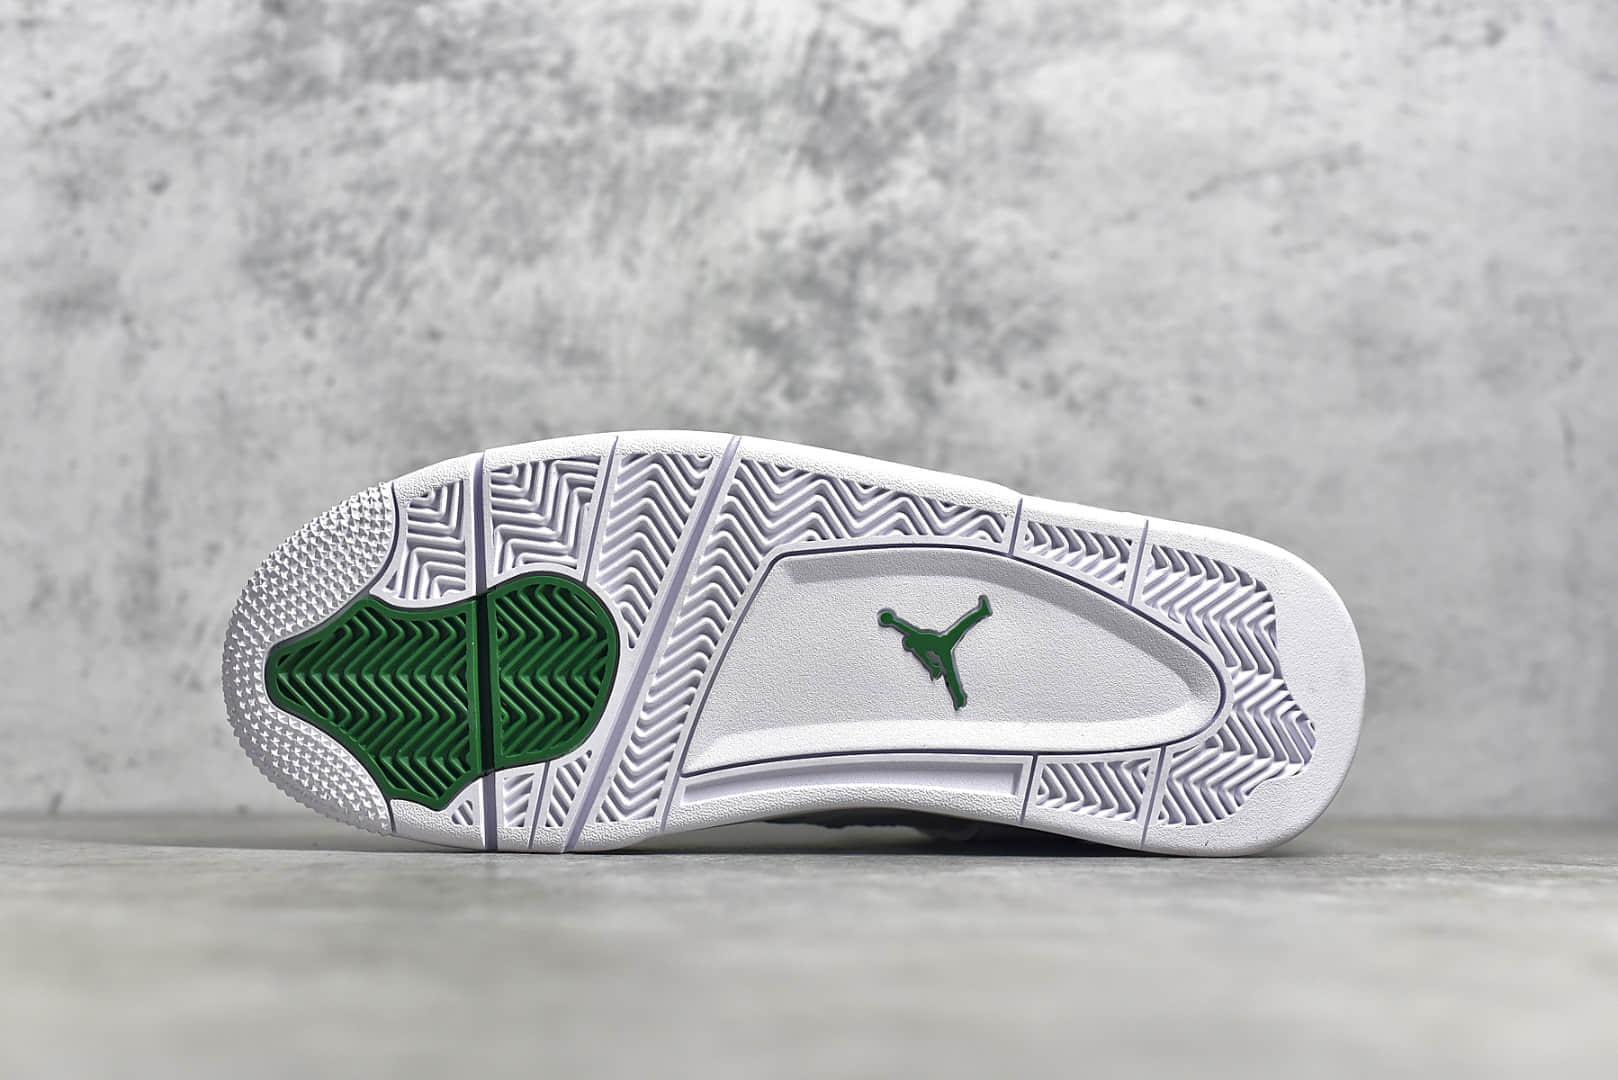 AJ4白绿金属绿高帮实战球鞋 Air Jordan 4 RETRO SE 金属绿莆田市面最高版本 货号:CT8527-113-潮流者之家